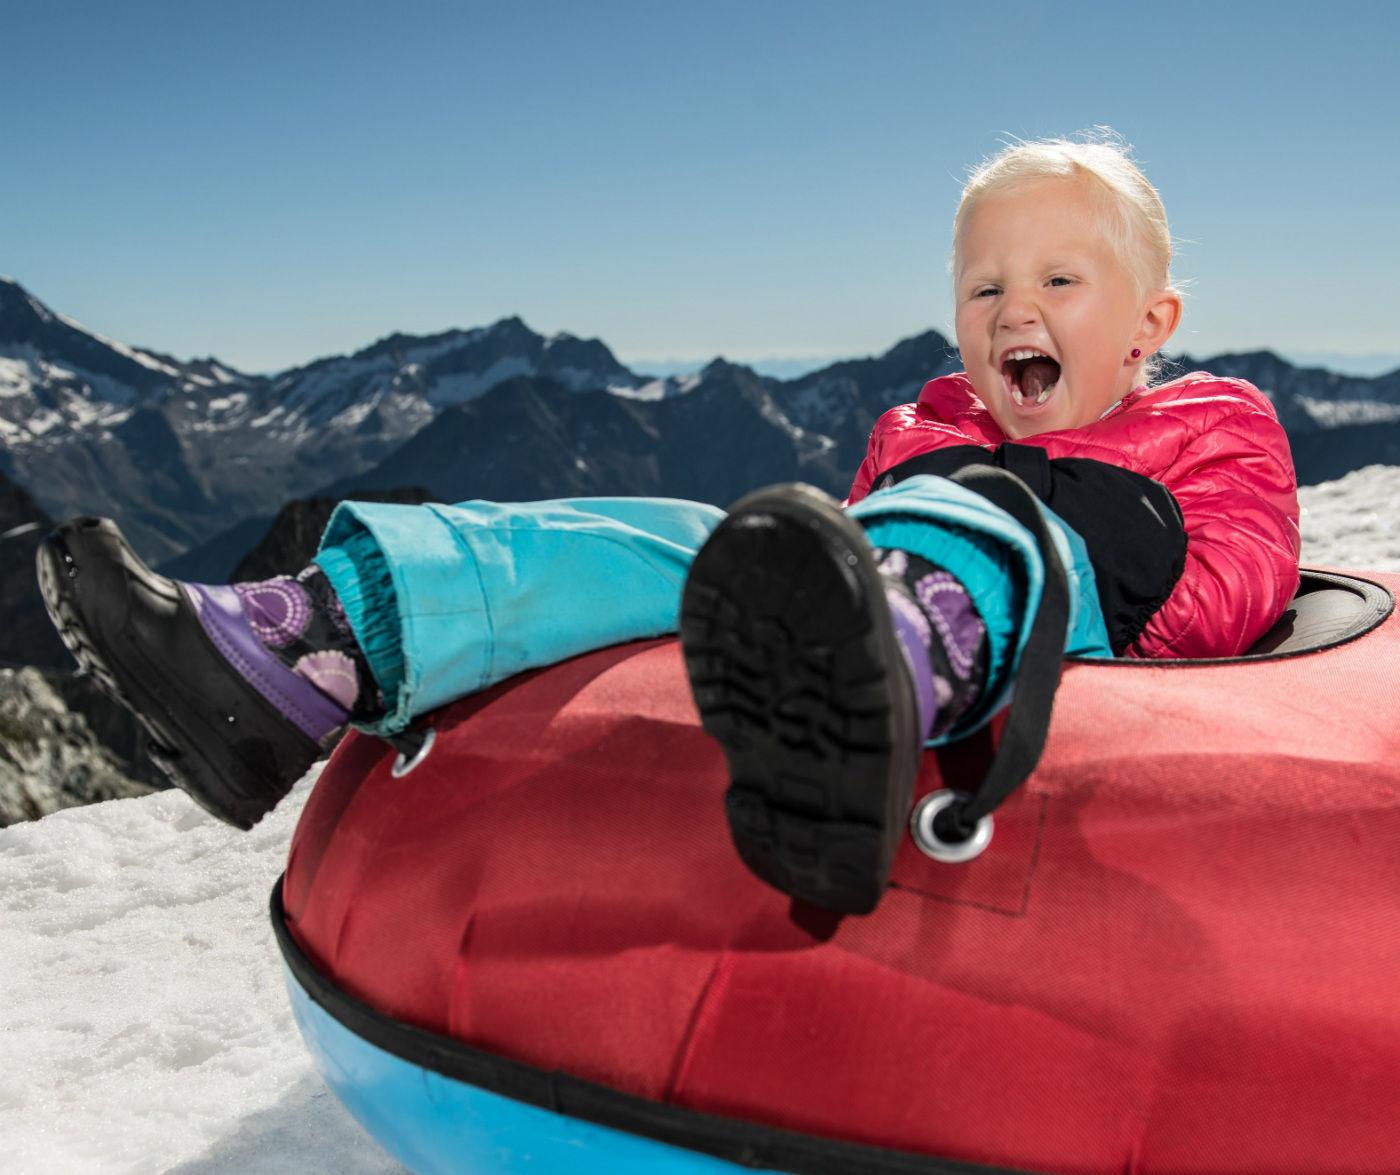 Swiss Glacier World Saas-Fee